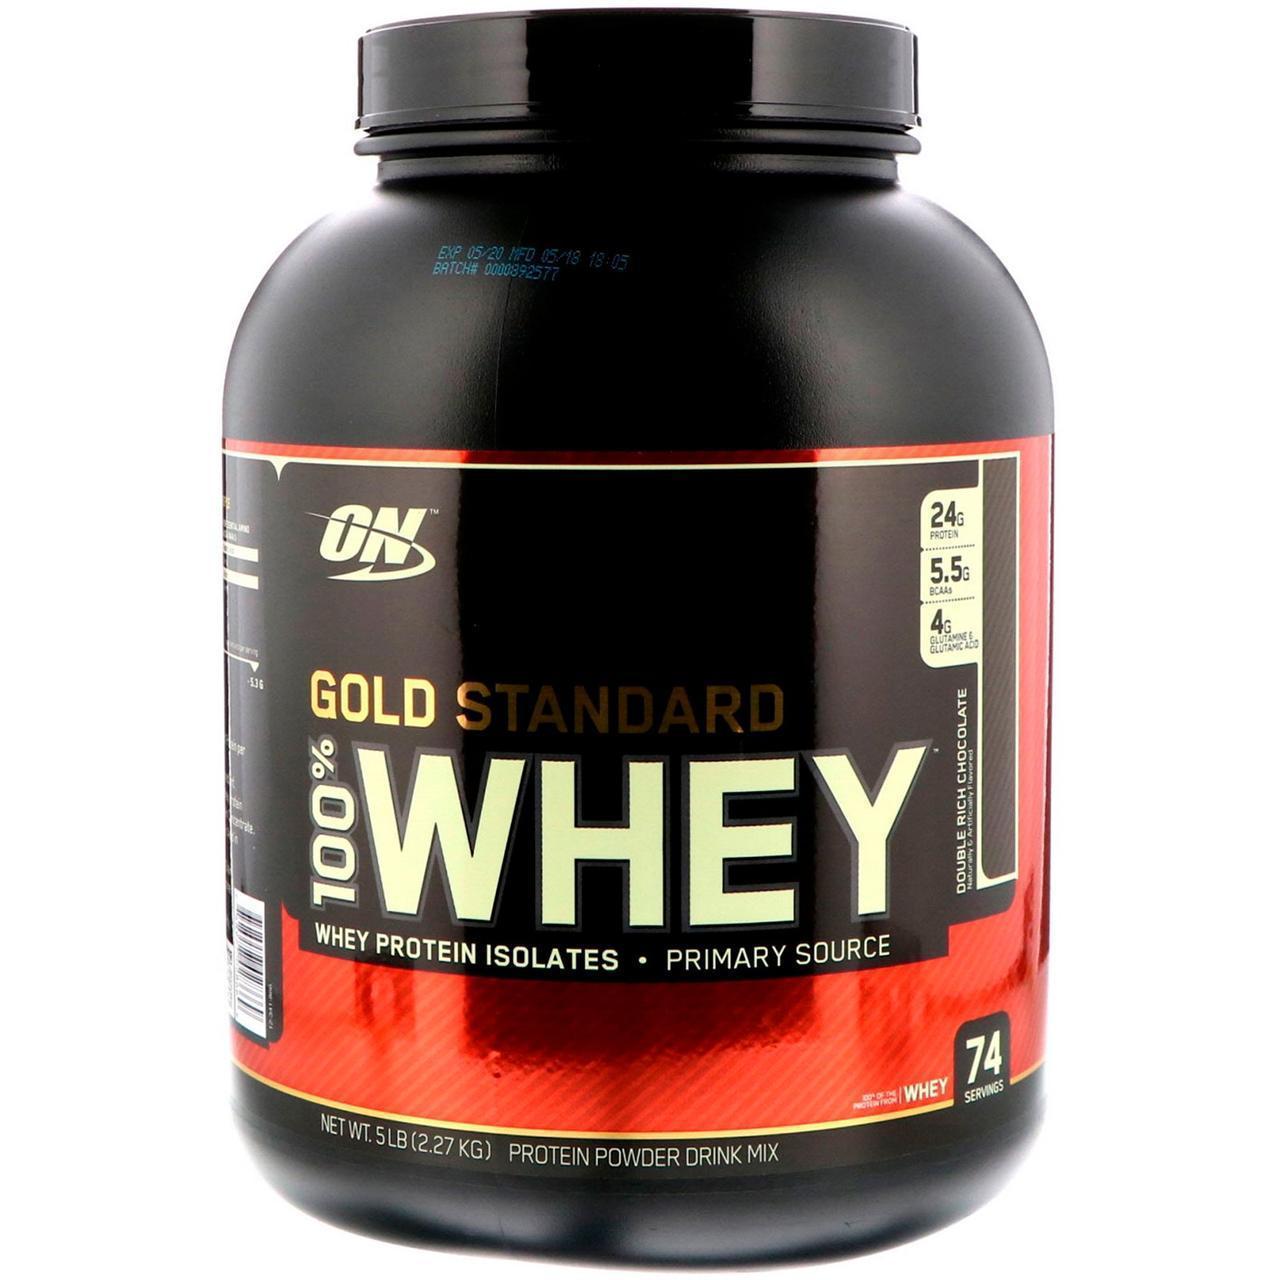 Optimum Nutrition Протеїни 100% Whey, подвійний шоколад, 2,27 кг